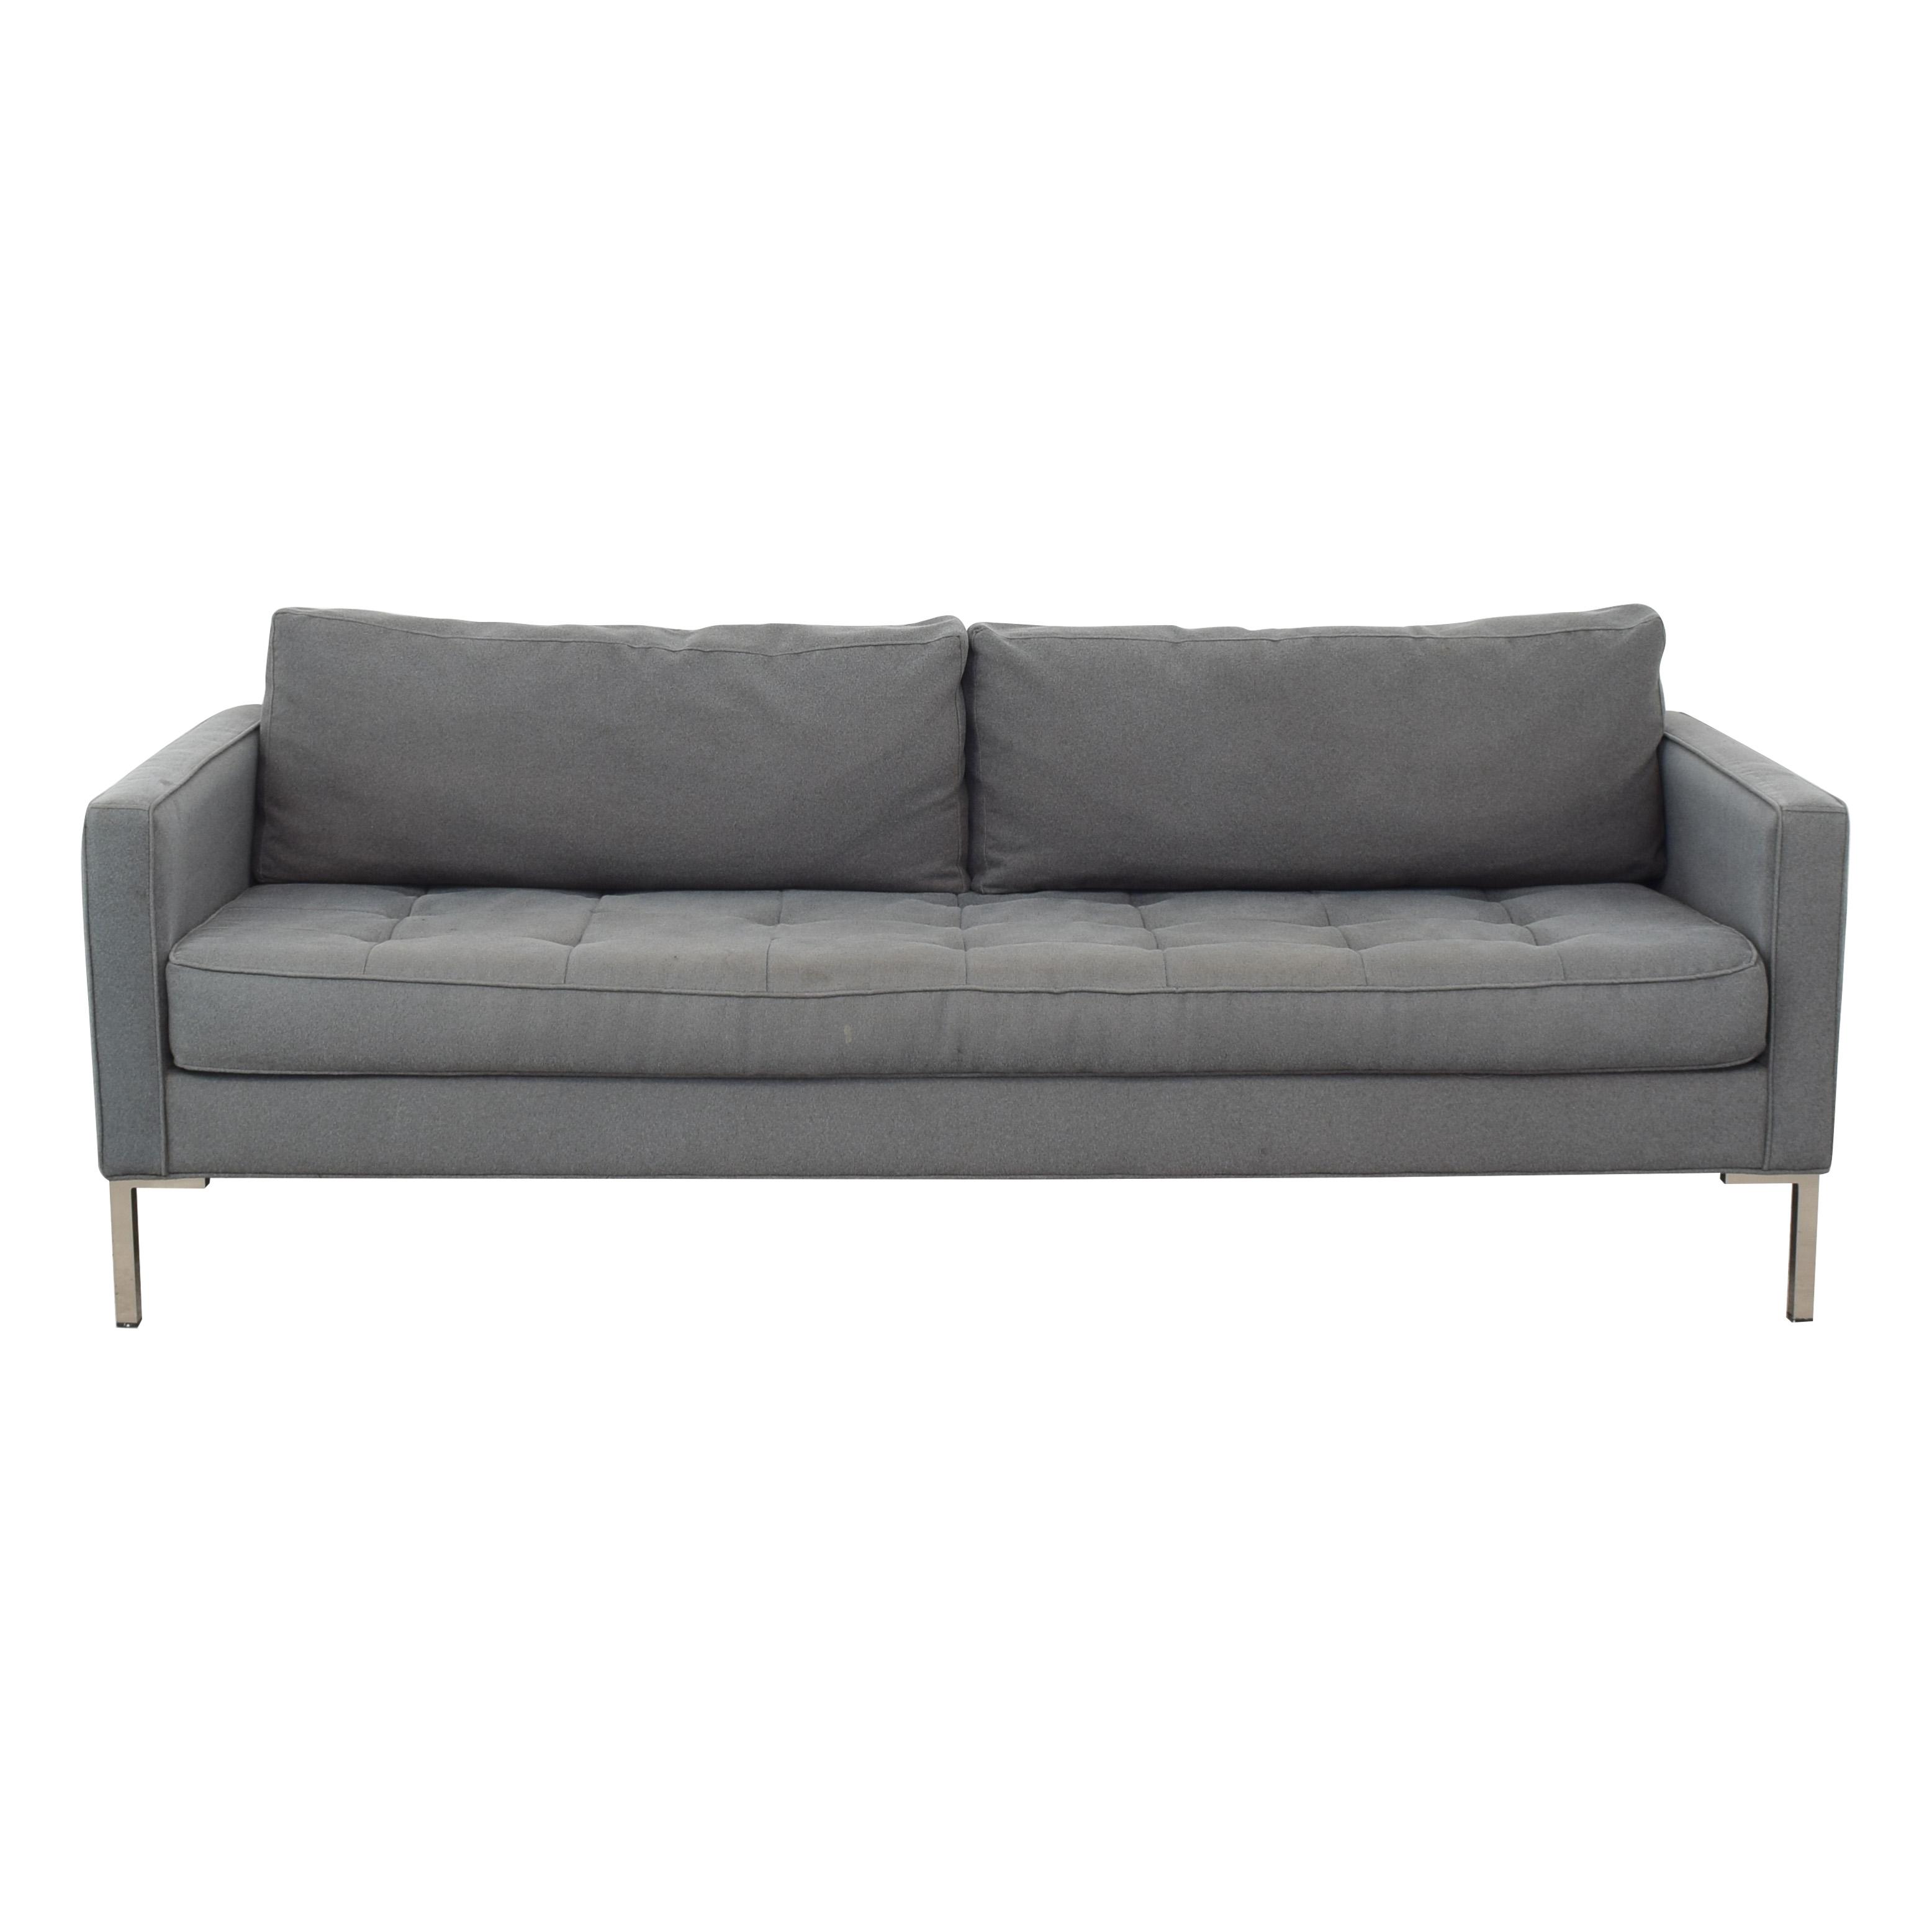 Blu Dot Blu Dot Paramount Modern Sofa dimensions